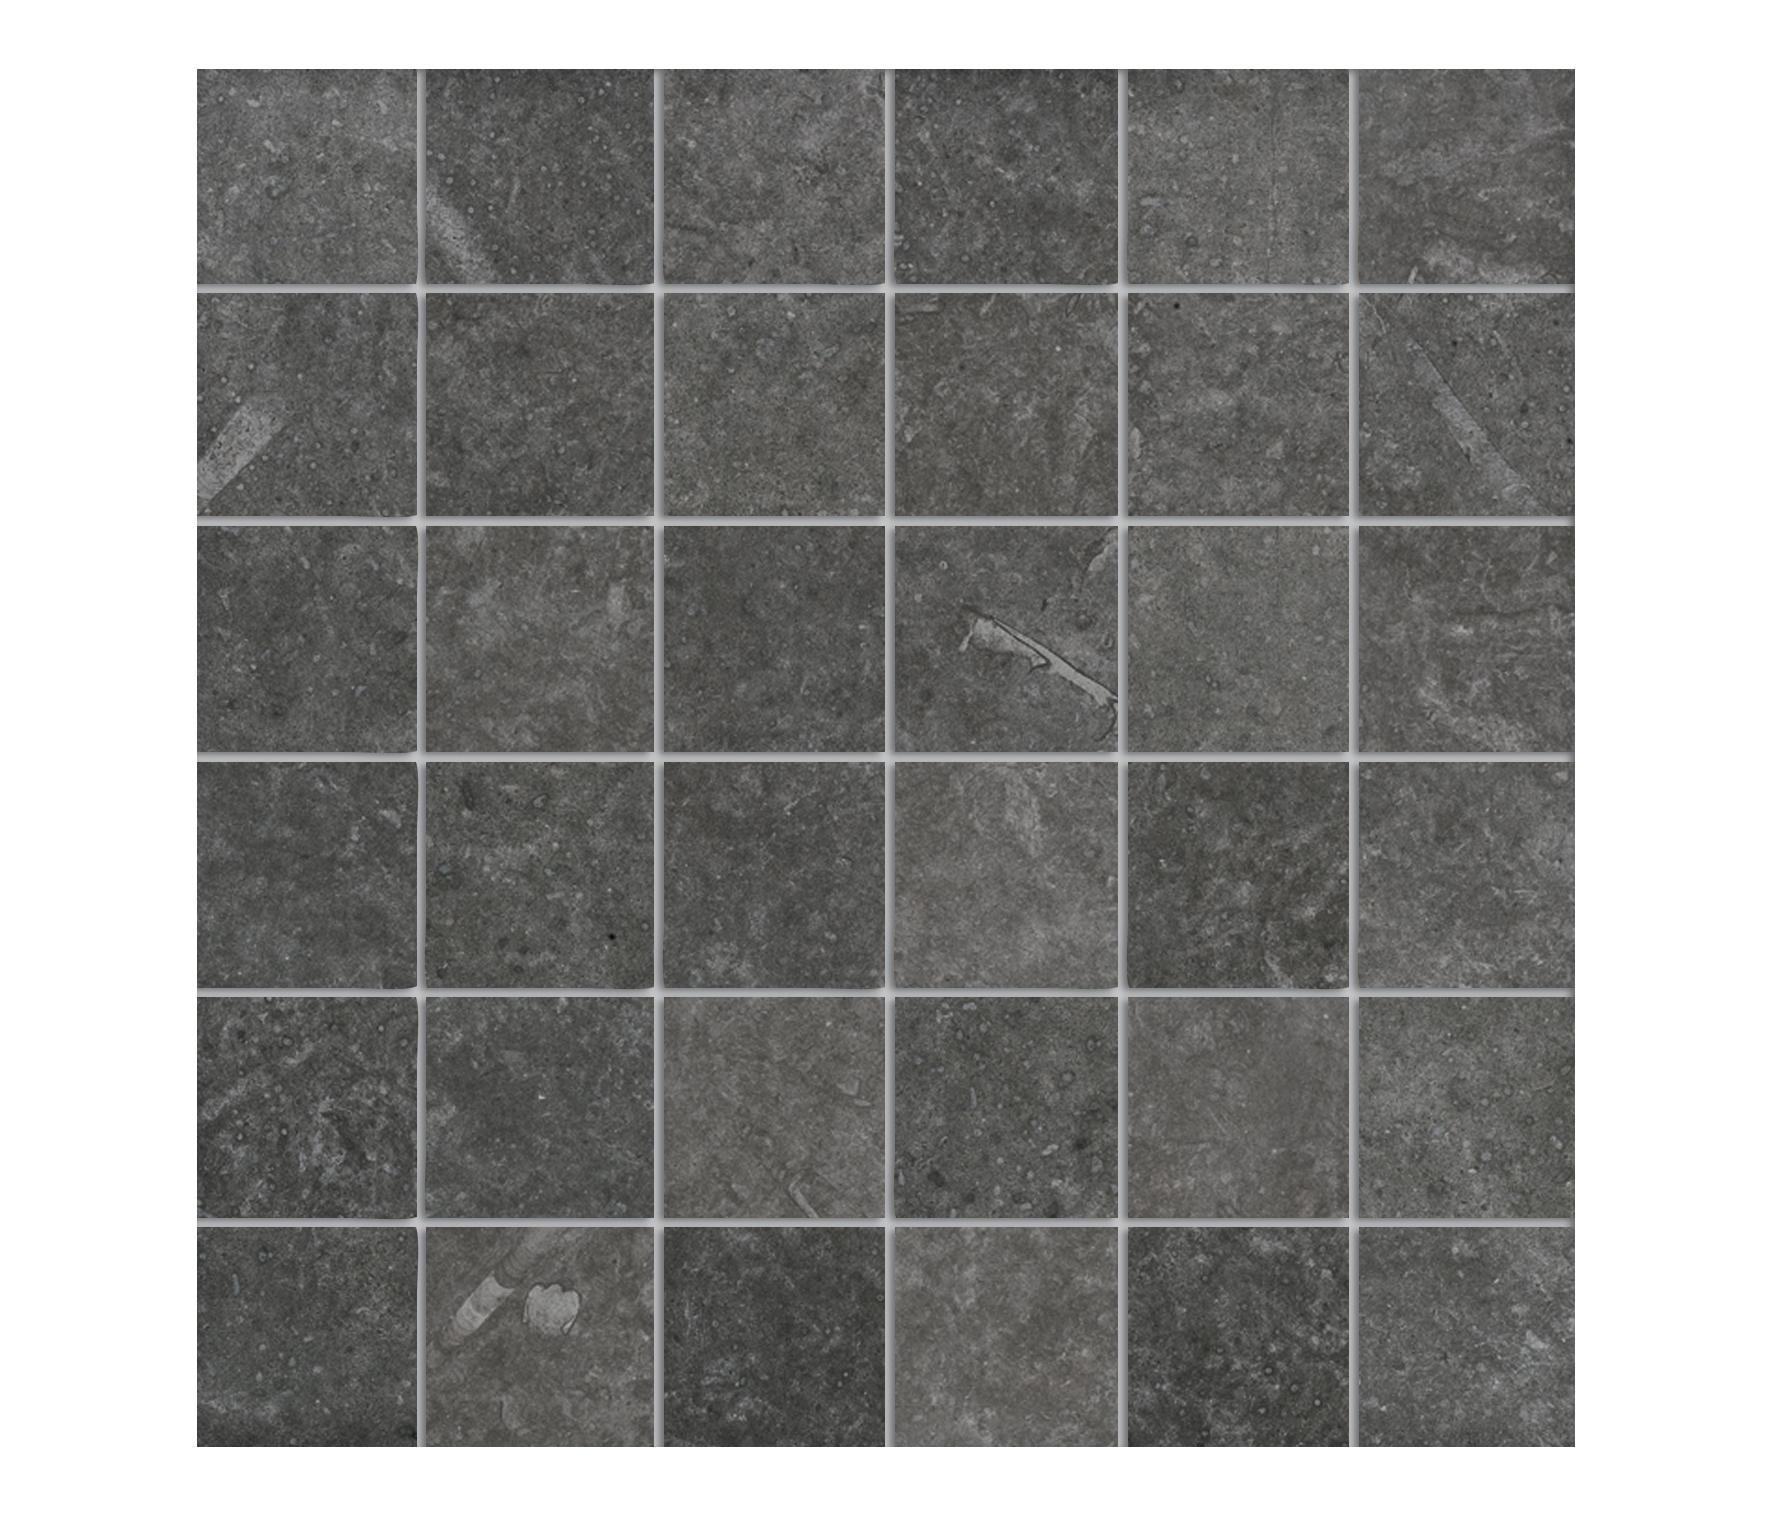 nordik mosaico 36 coal bodenfliesen von refin architonic. Black Bedroom Furniture Sets. Home Design Ideas